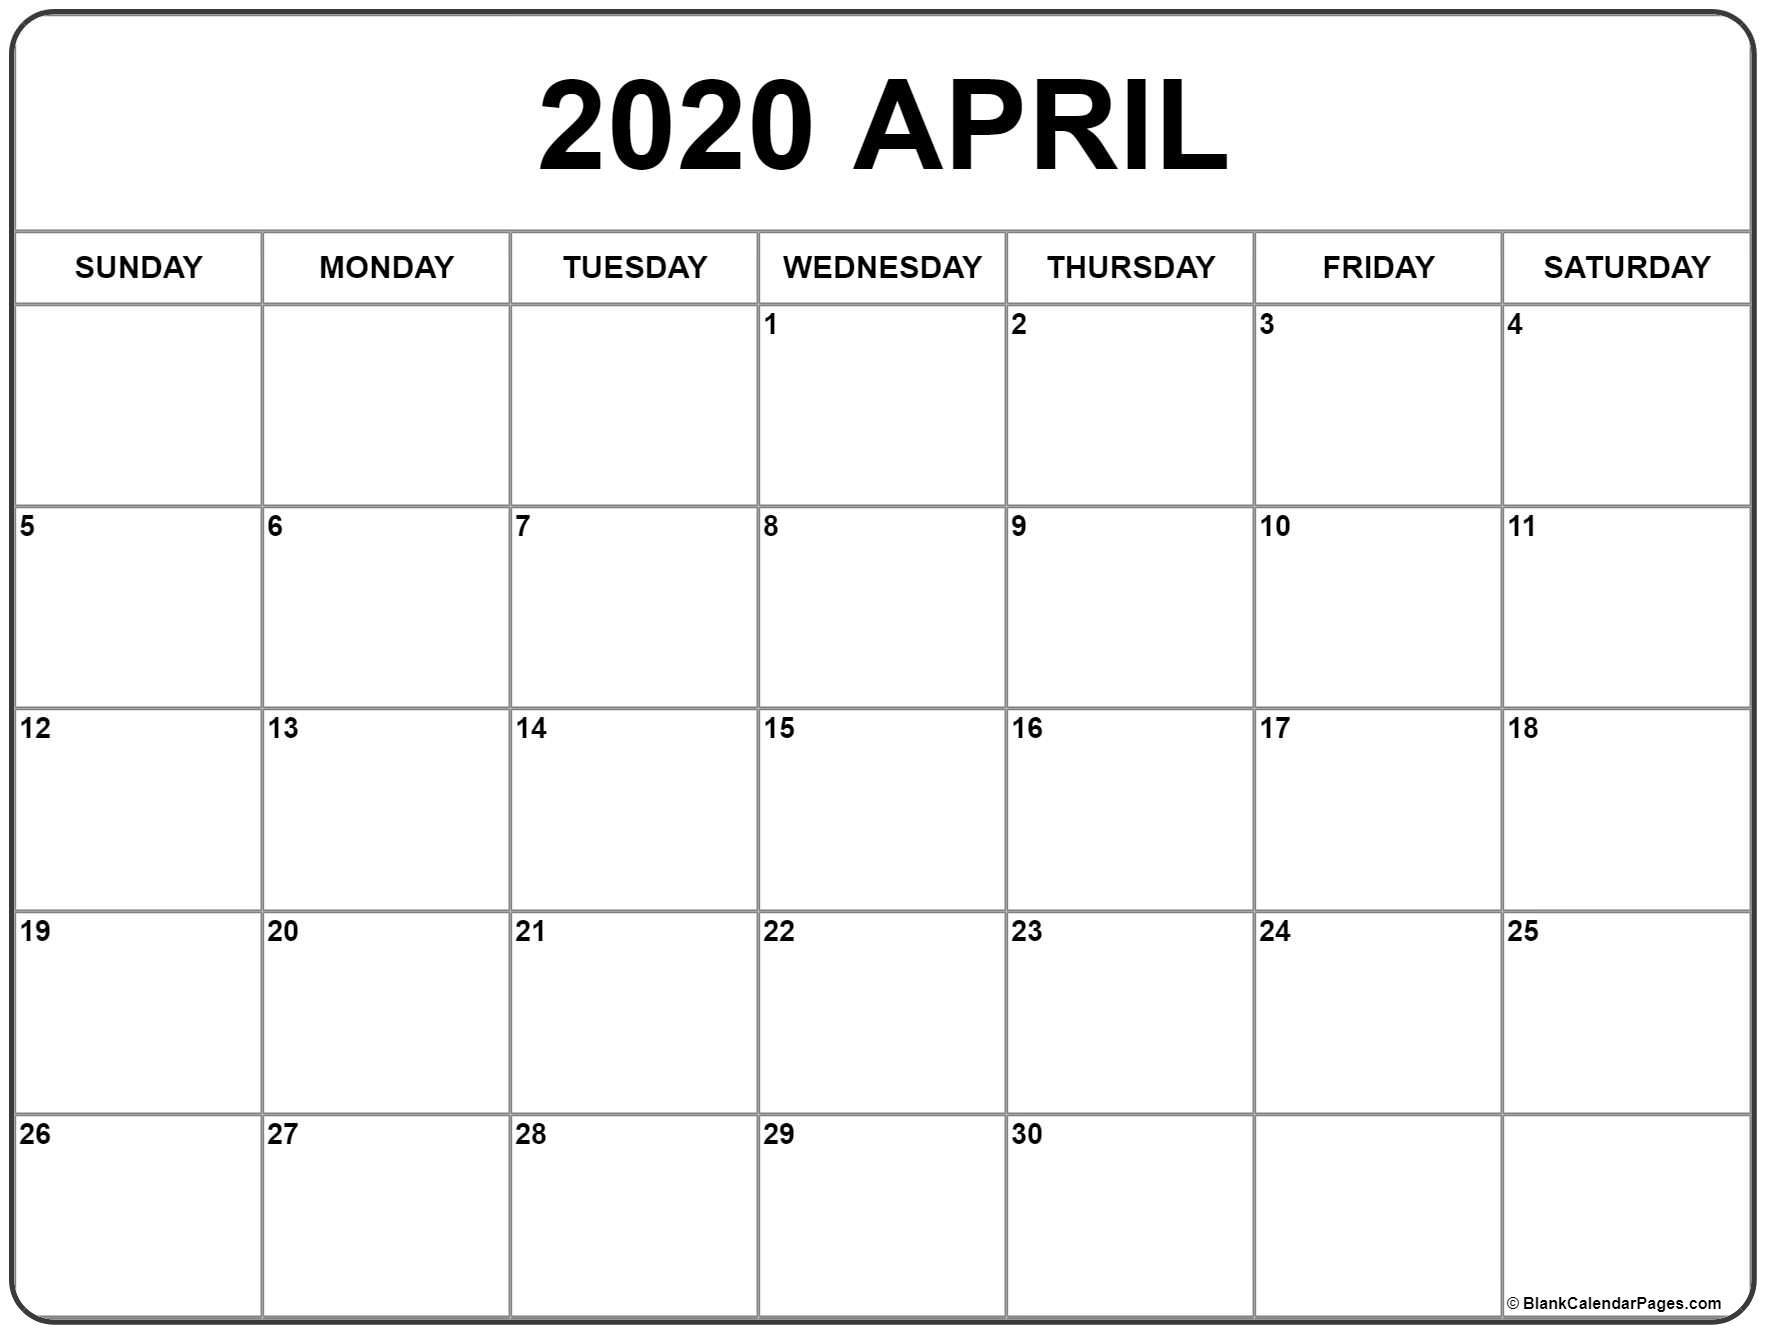 April 2020 Calendar | Free Printable Monthly Calendars-Create 2020 - 2021 Blank Monthly Calendar